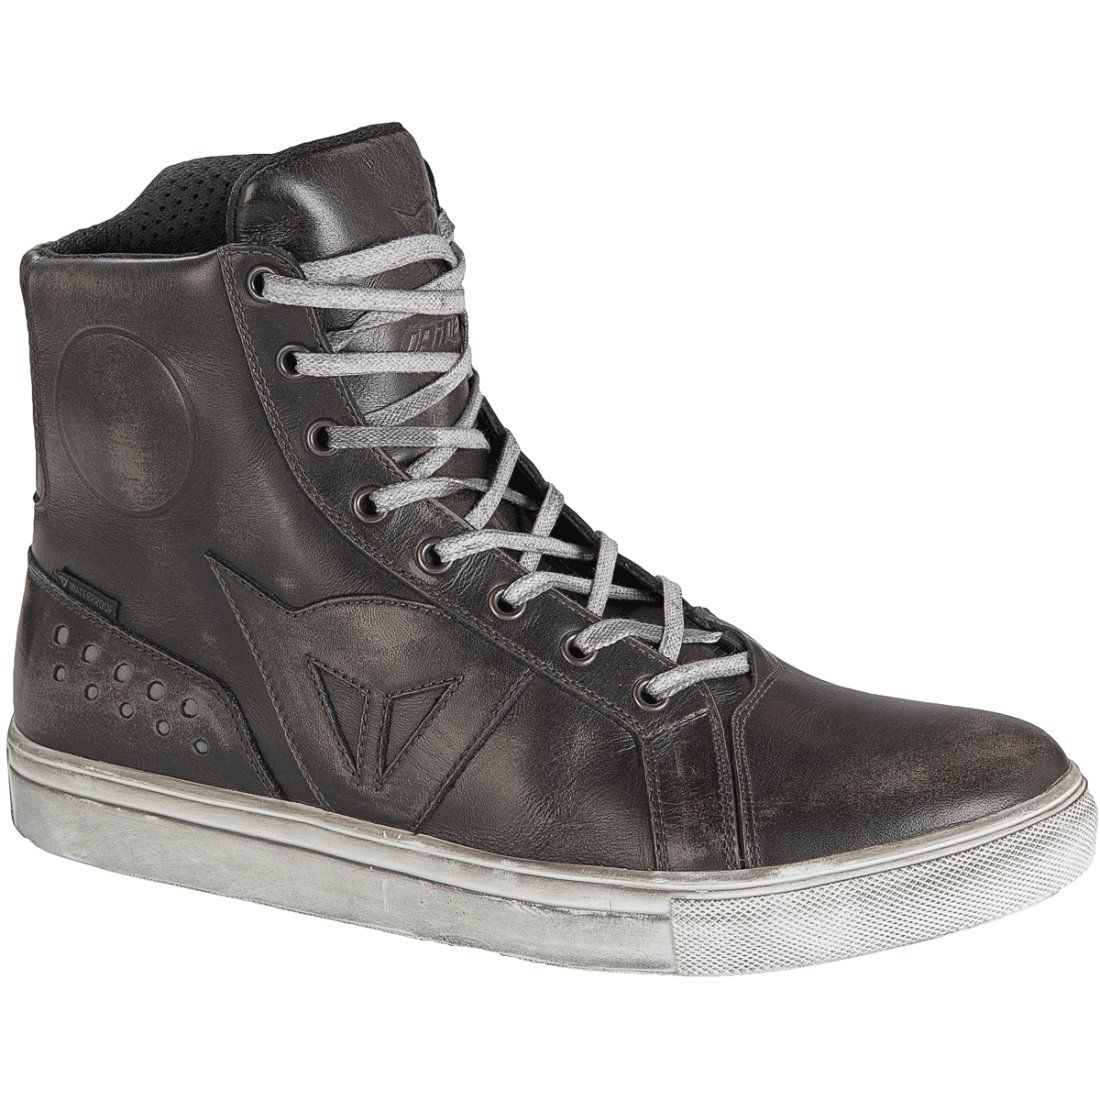 Dainese Wp · Street Motocard D Rocker Boots N OwFvCrOq